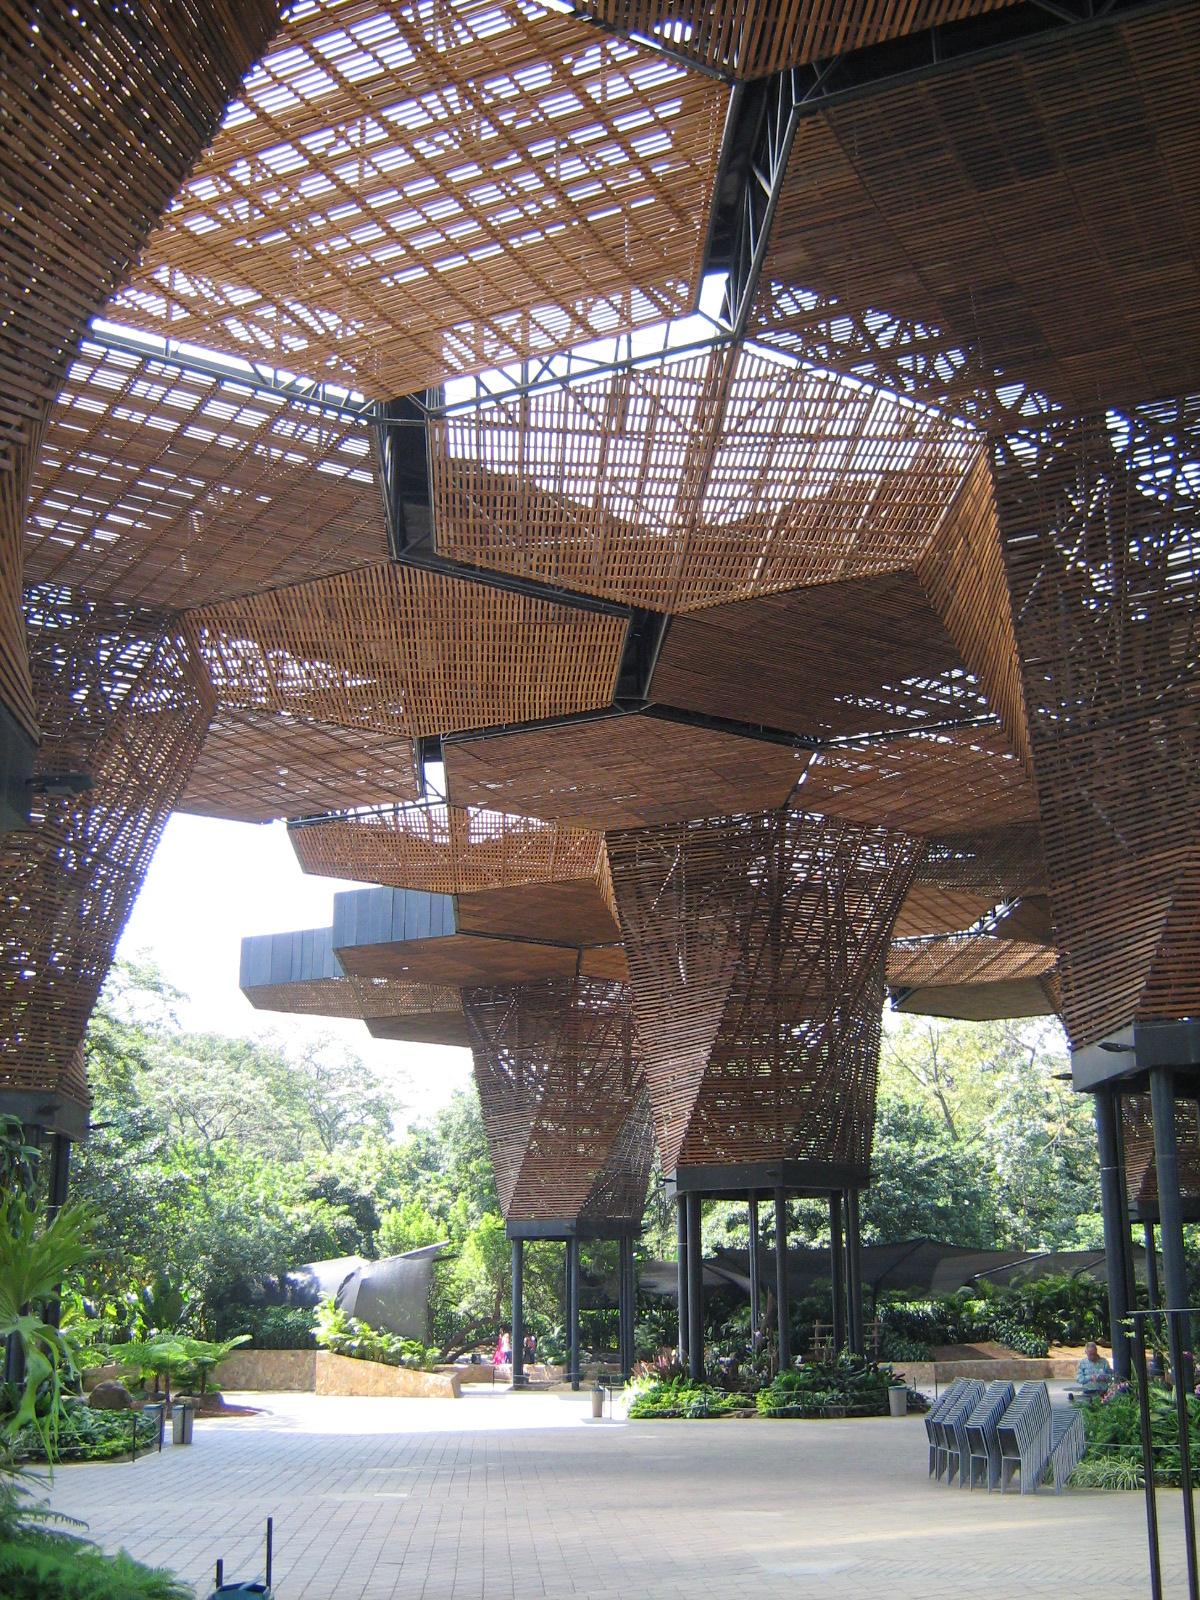 File jardin botanico de medellin orquideorama 11 jpg for Bodas en el jardin botanico medellin